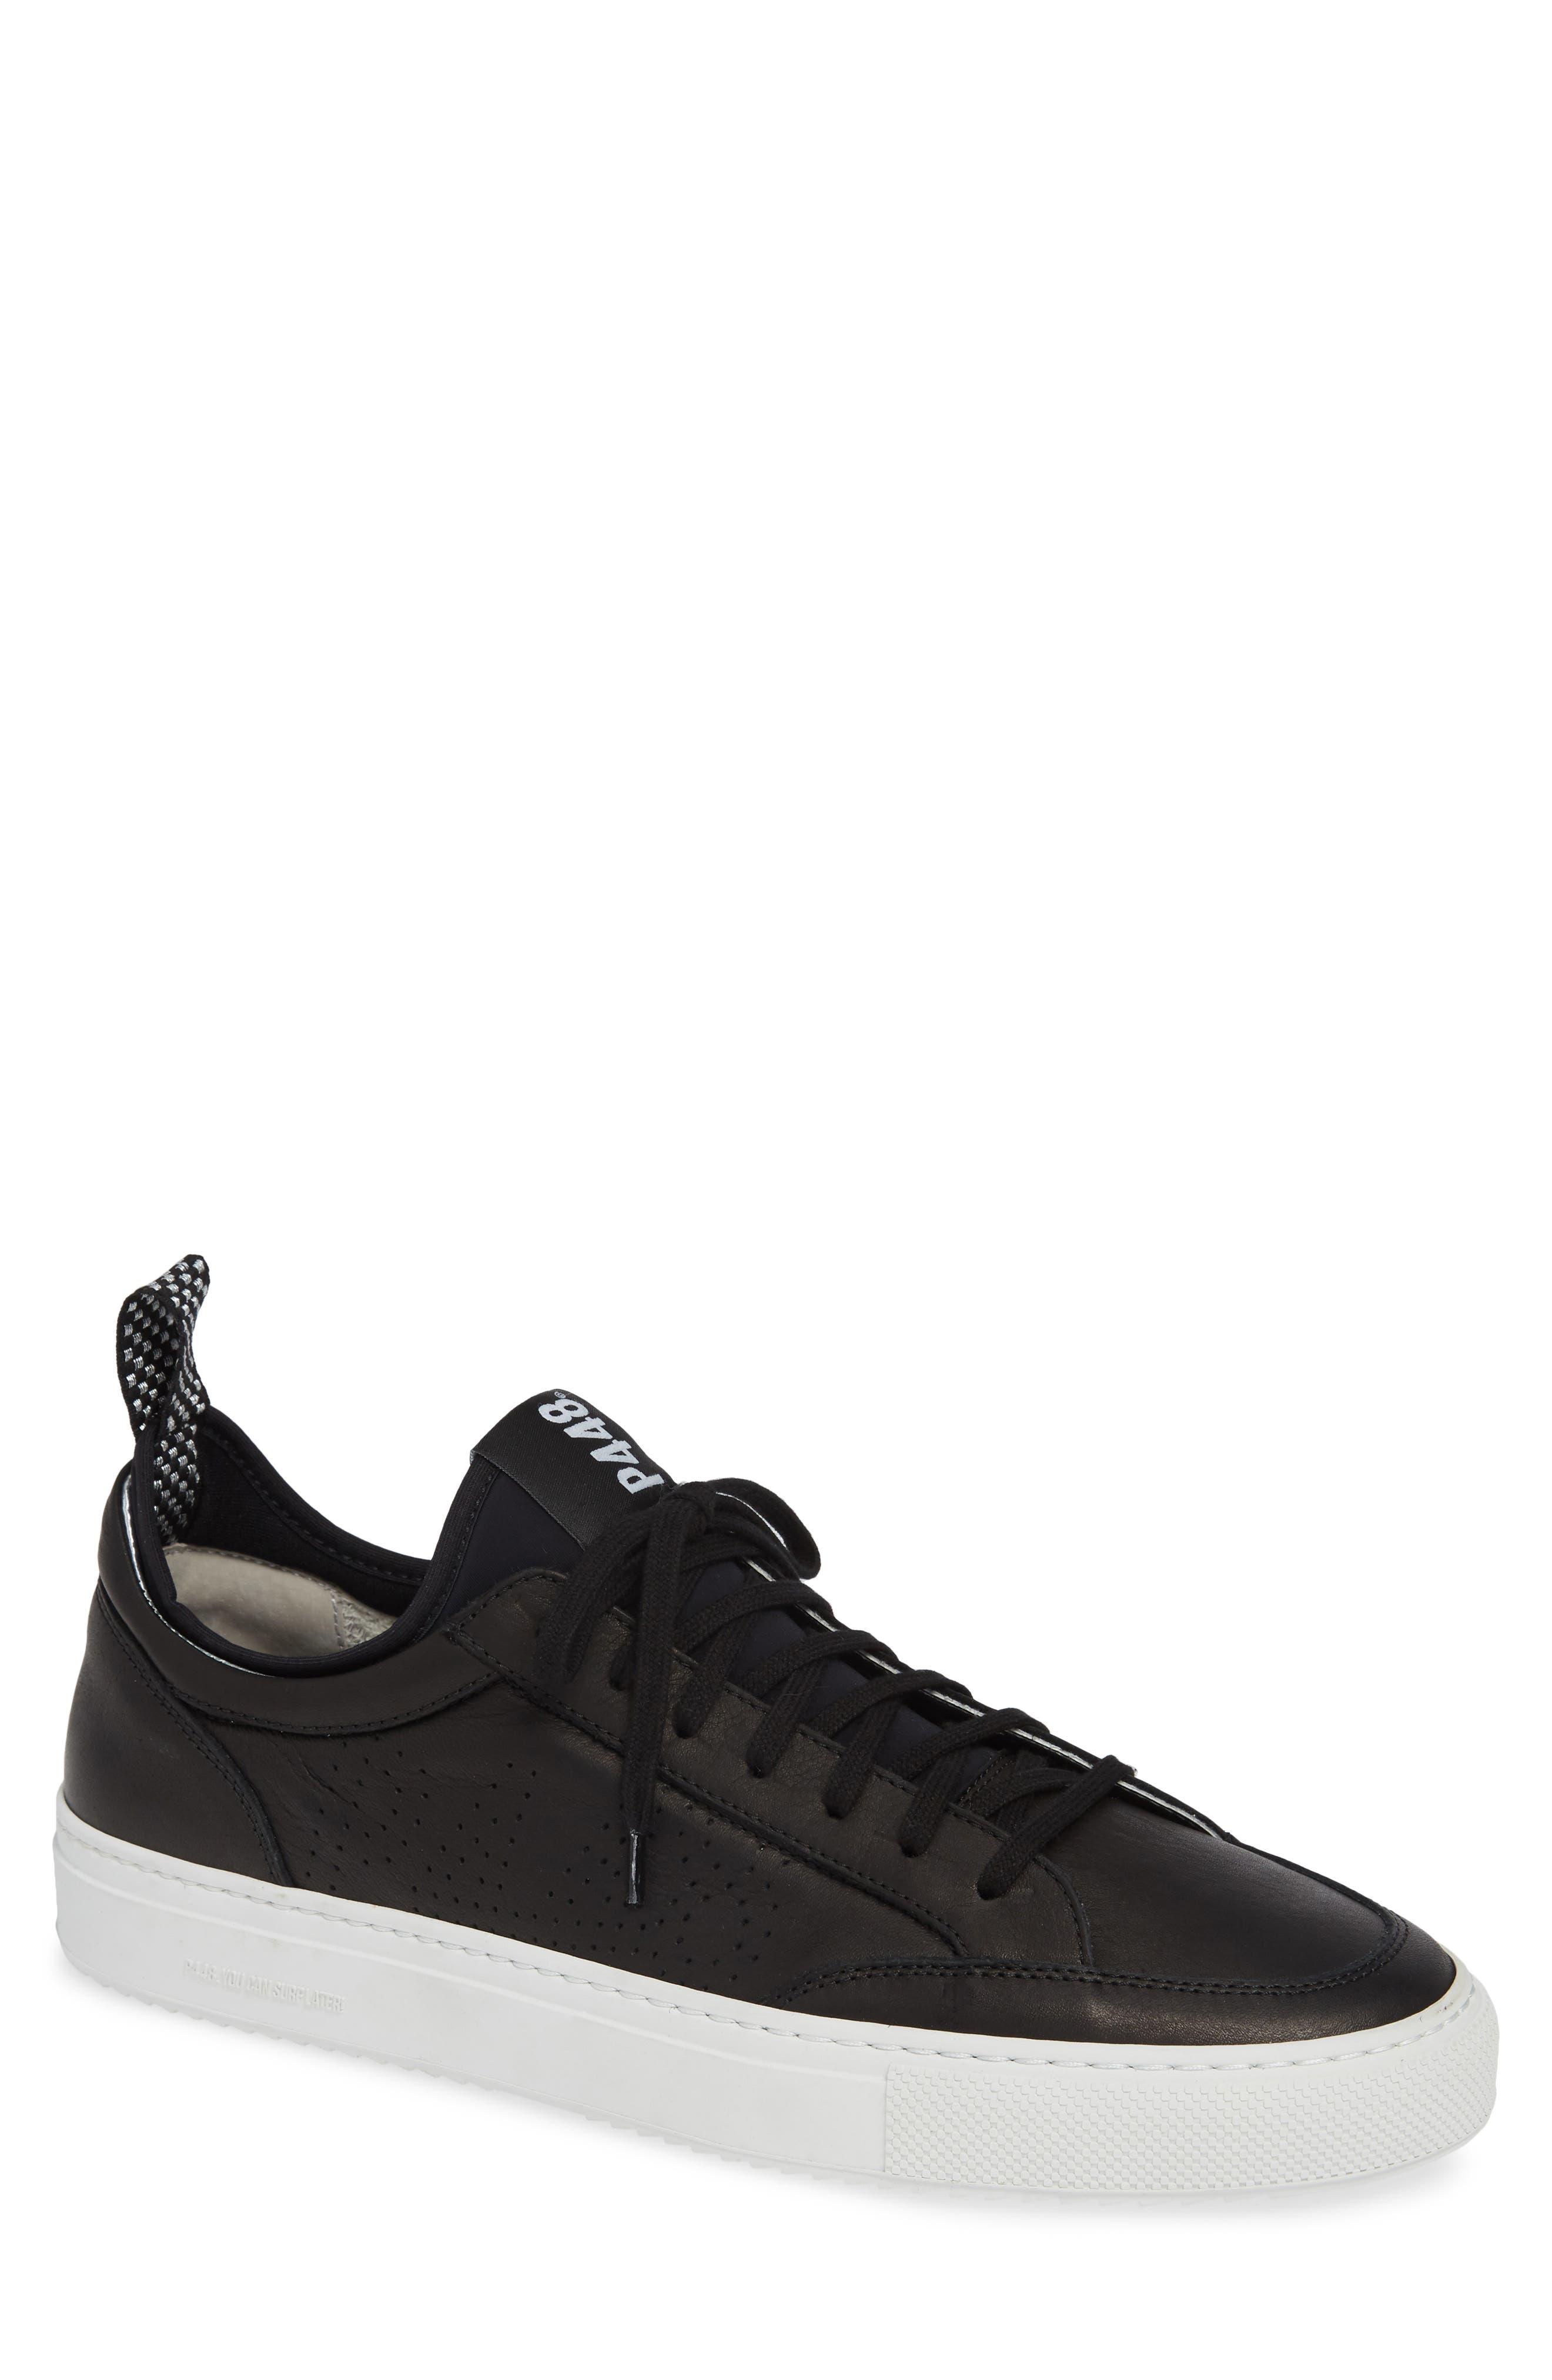 Absohosocks Sneaker,                         Main,                         color, BLACK